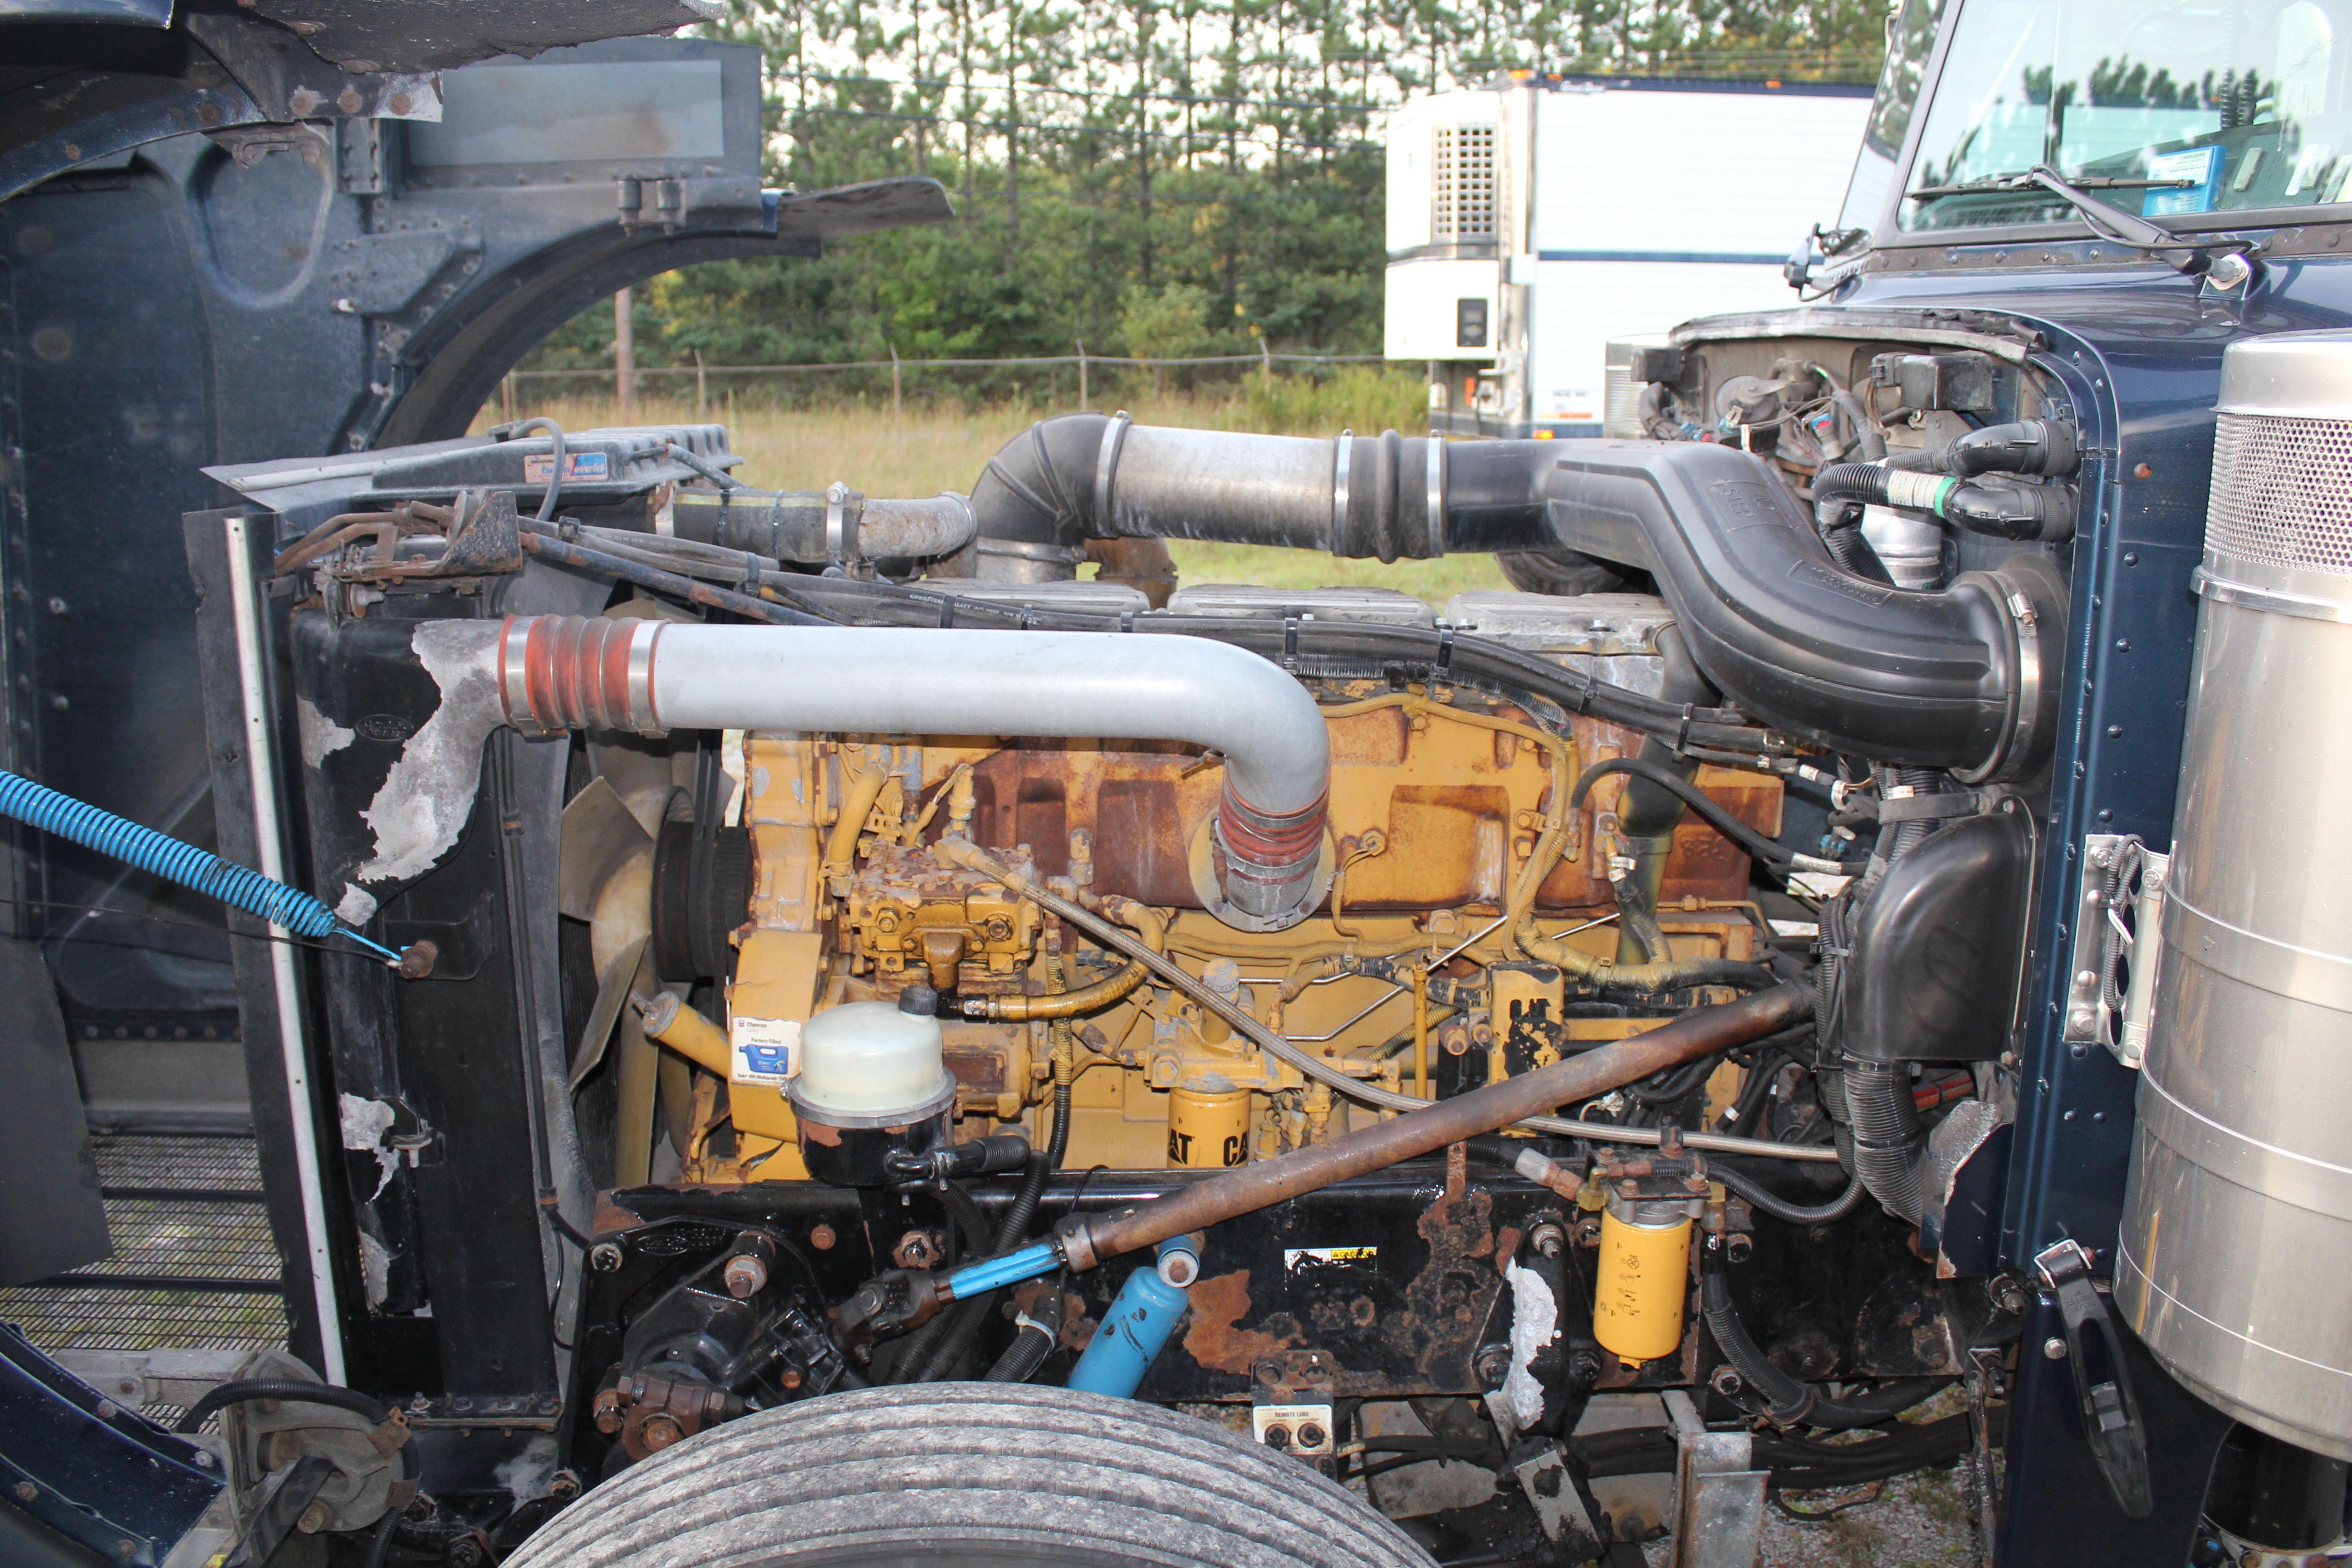 475 caterpillar truck engine big rig diesel motors pinterest cats truck engine and trucks. Black Bedroom Furniture Sets. Home Design Ideas